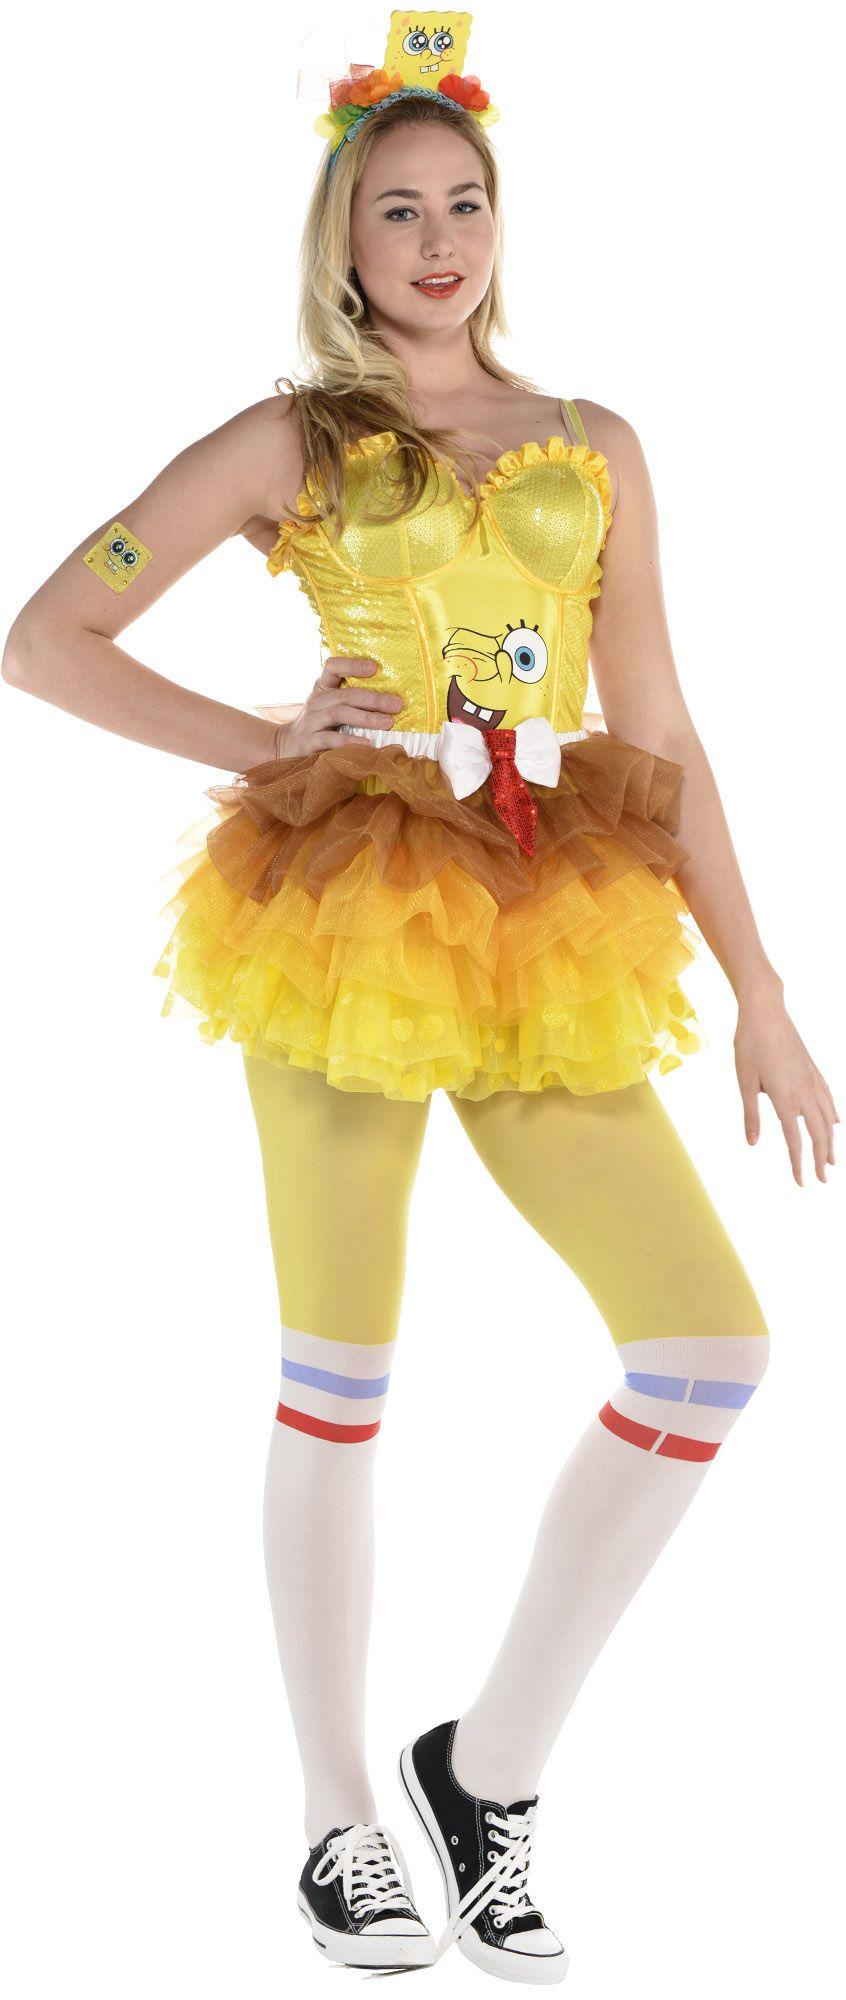 Create Your Own Look - Female Sponge Bob #1